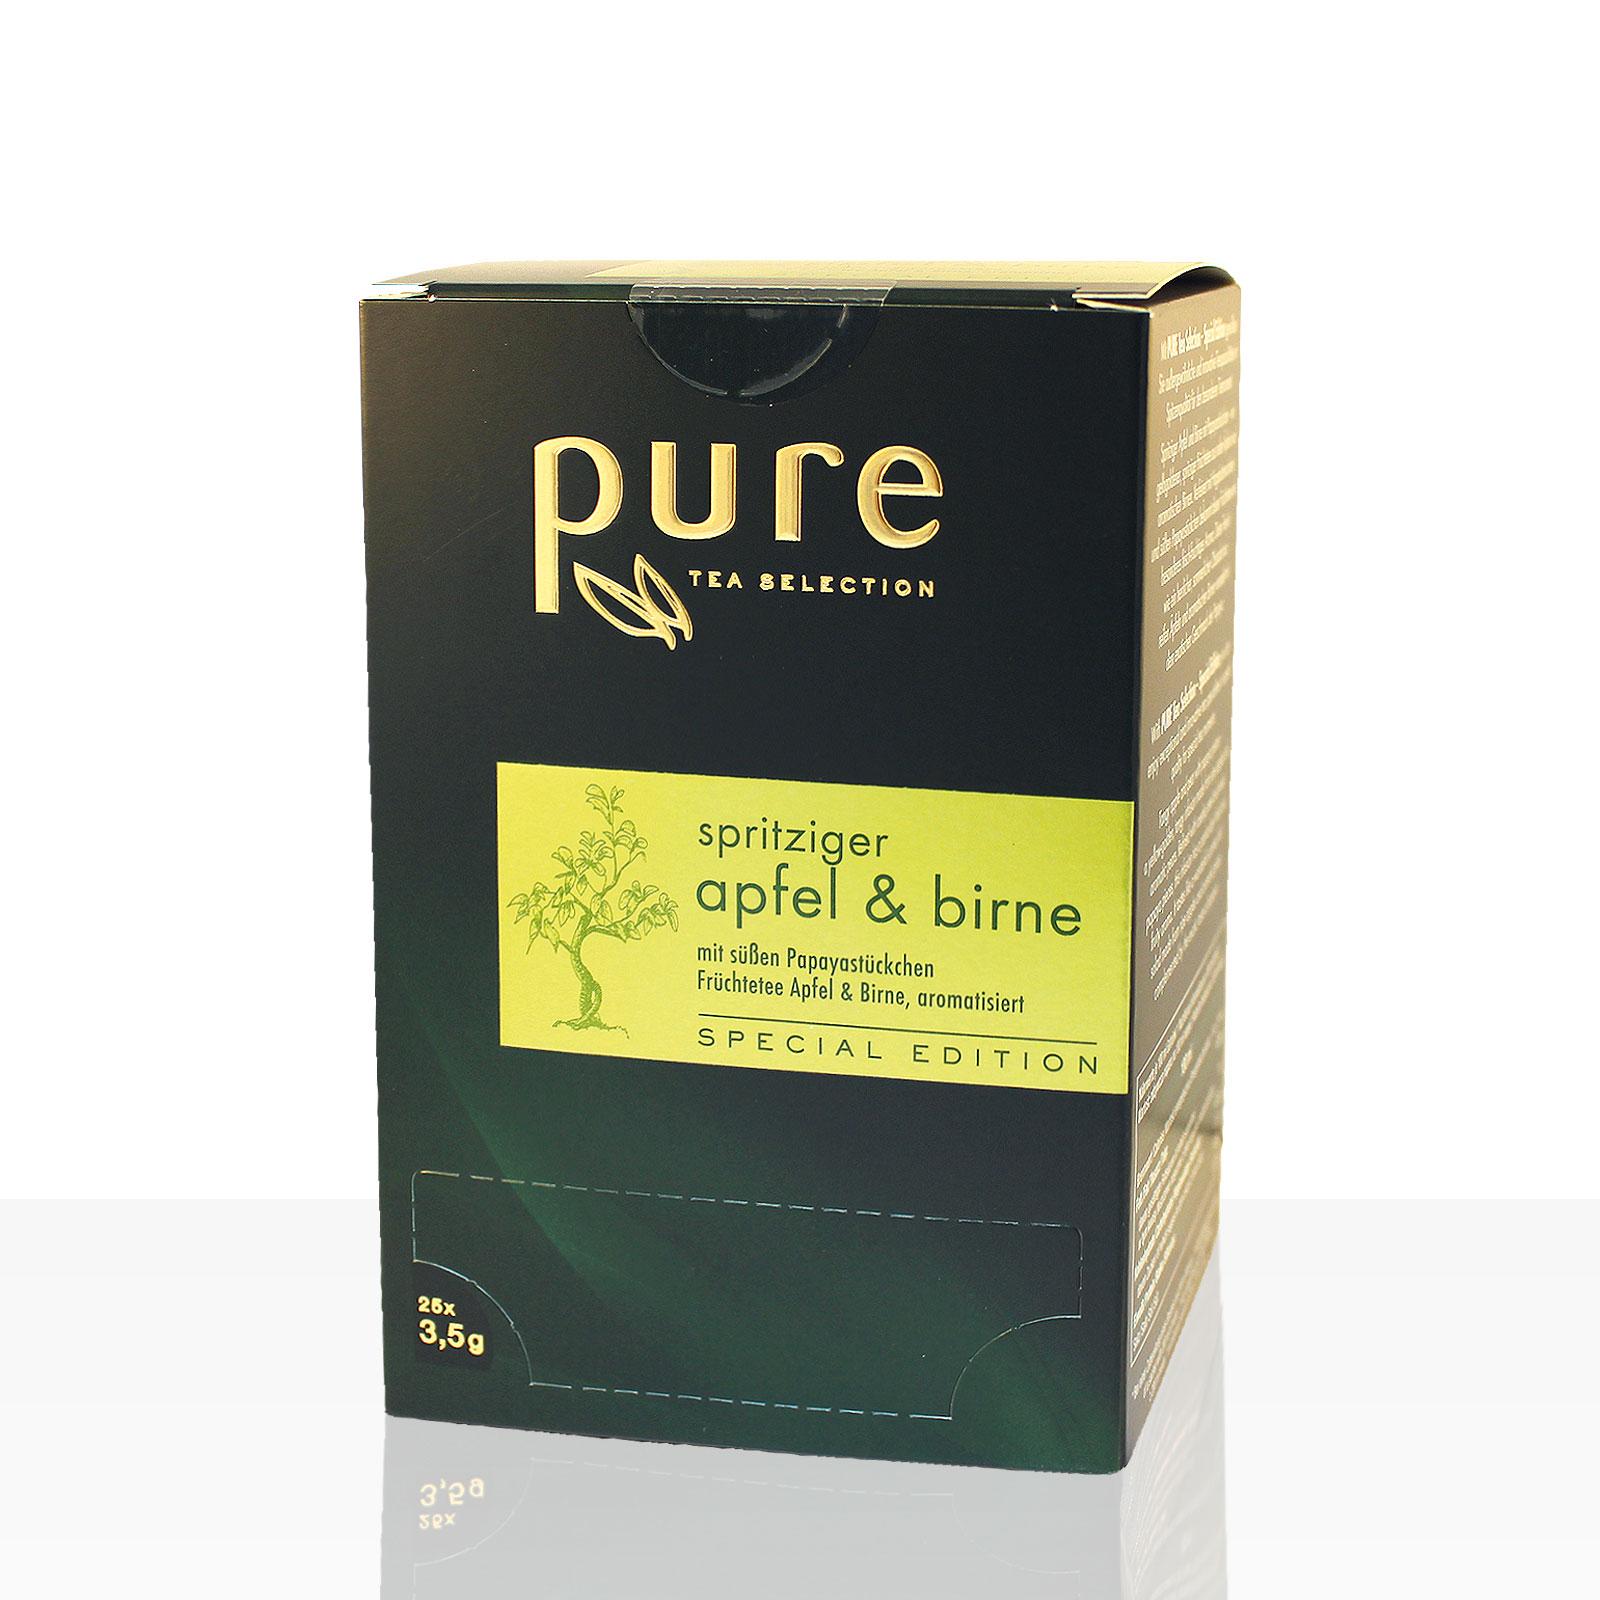 Pure Tea spritziger Apfel & Birne 4 x 25 Beutel Tee, Special Edition